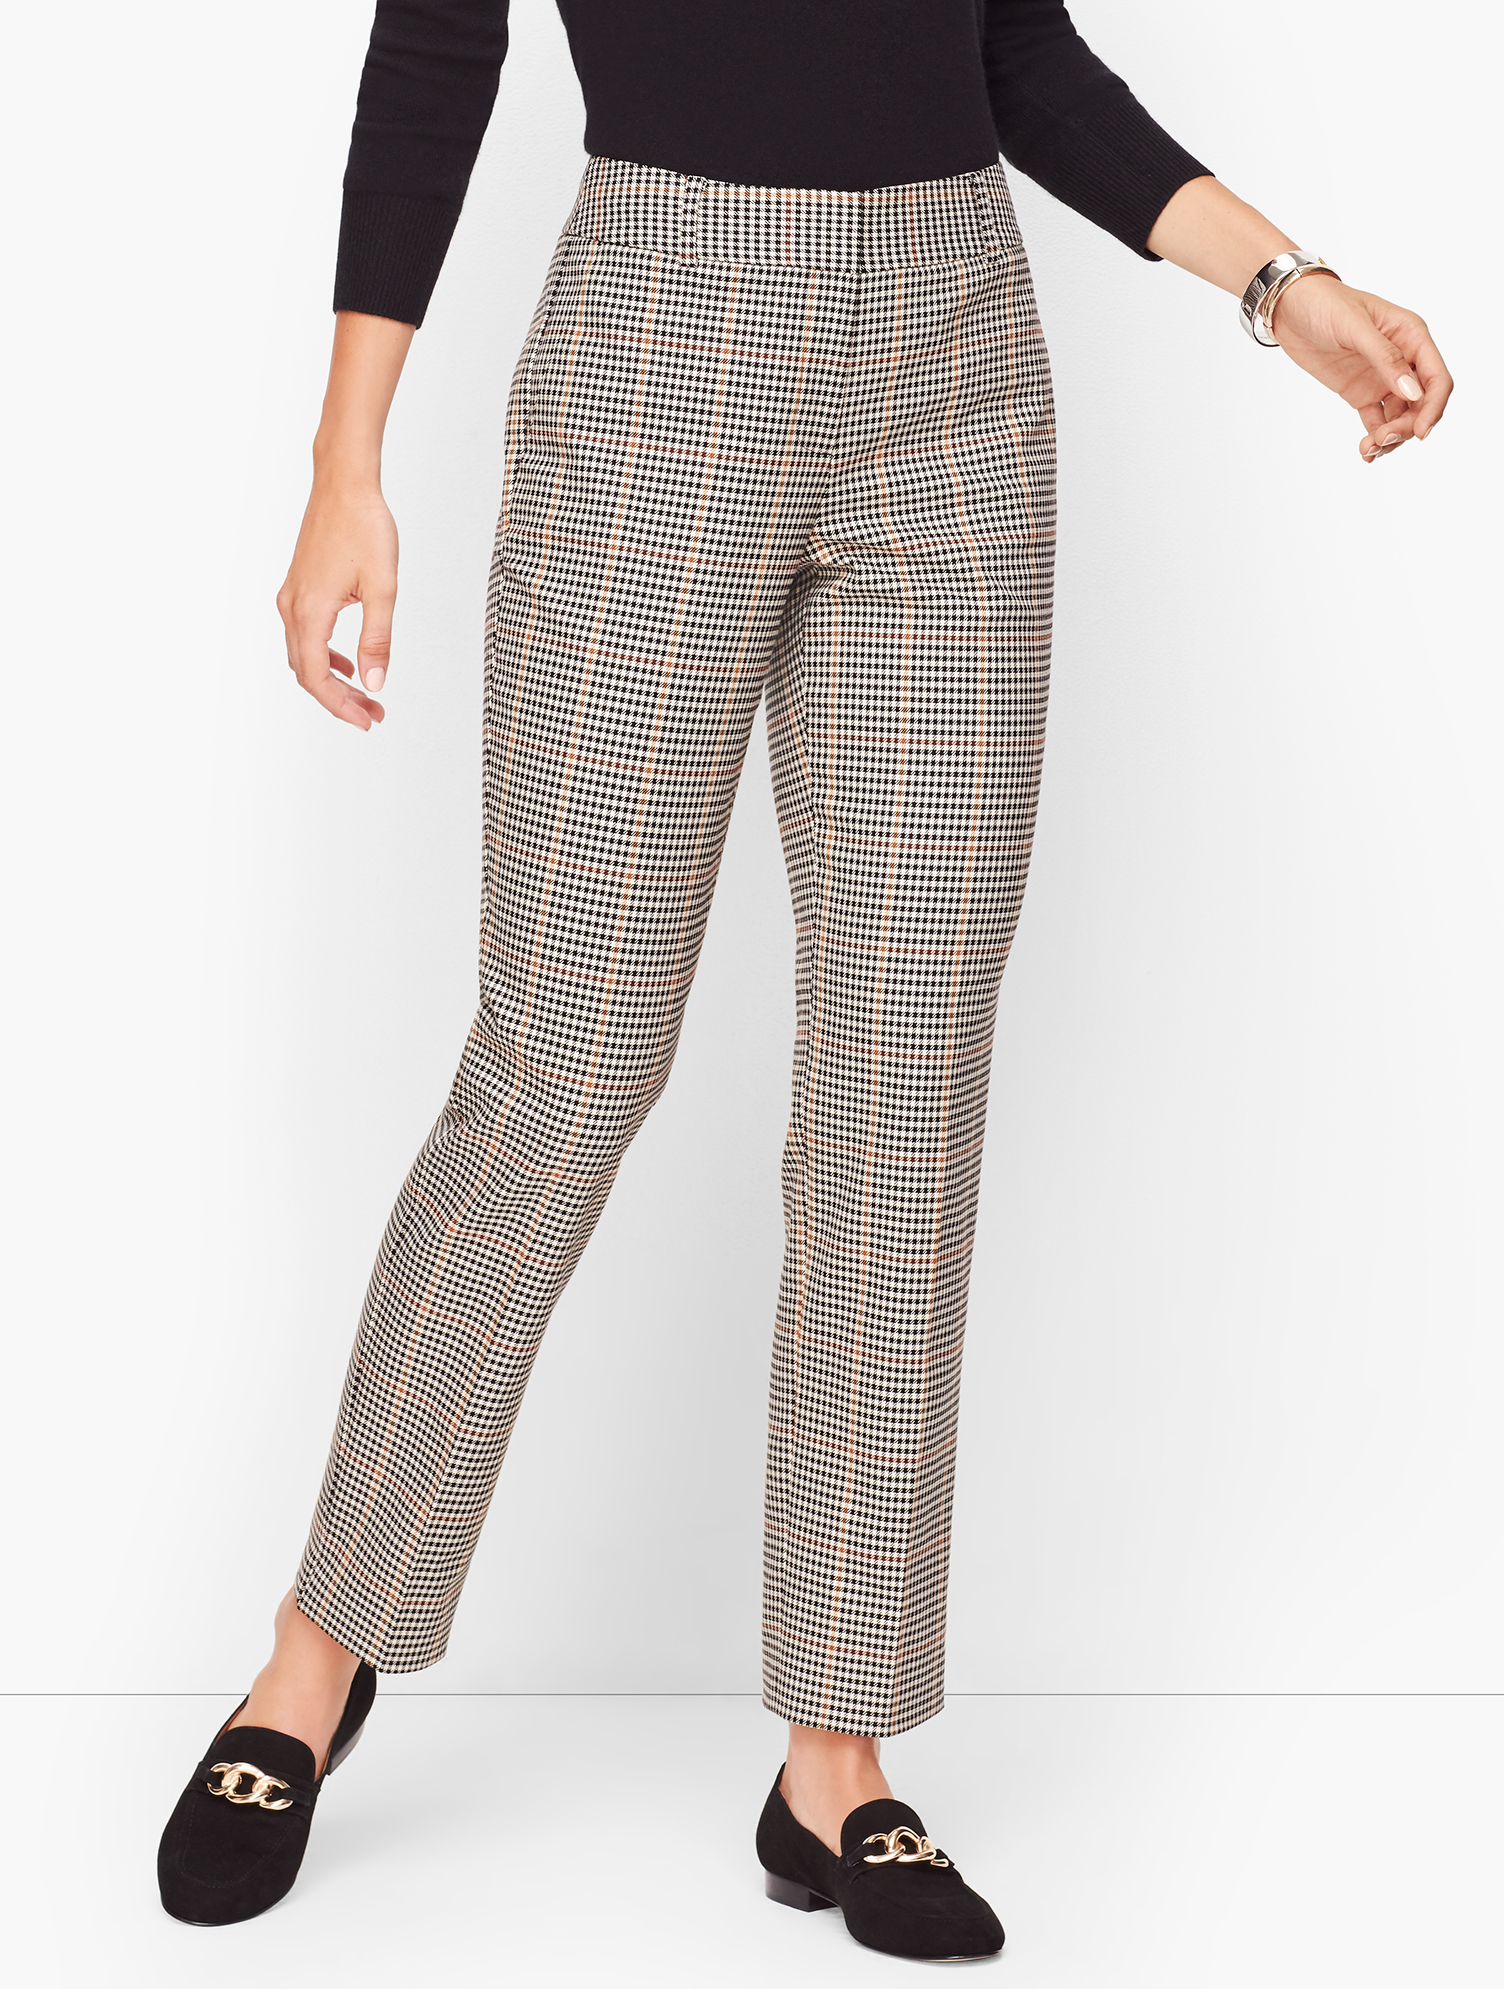 Vintage High Waisted Trousers, Sailor Pants, Jeans Talbots Hampshire Ankle Pants - Colton Check - Curvy Fit - Black Mutli - 16 $79.99 AT vintagedancer.com